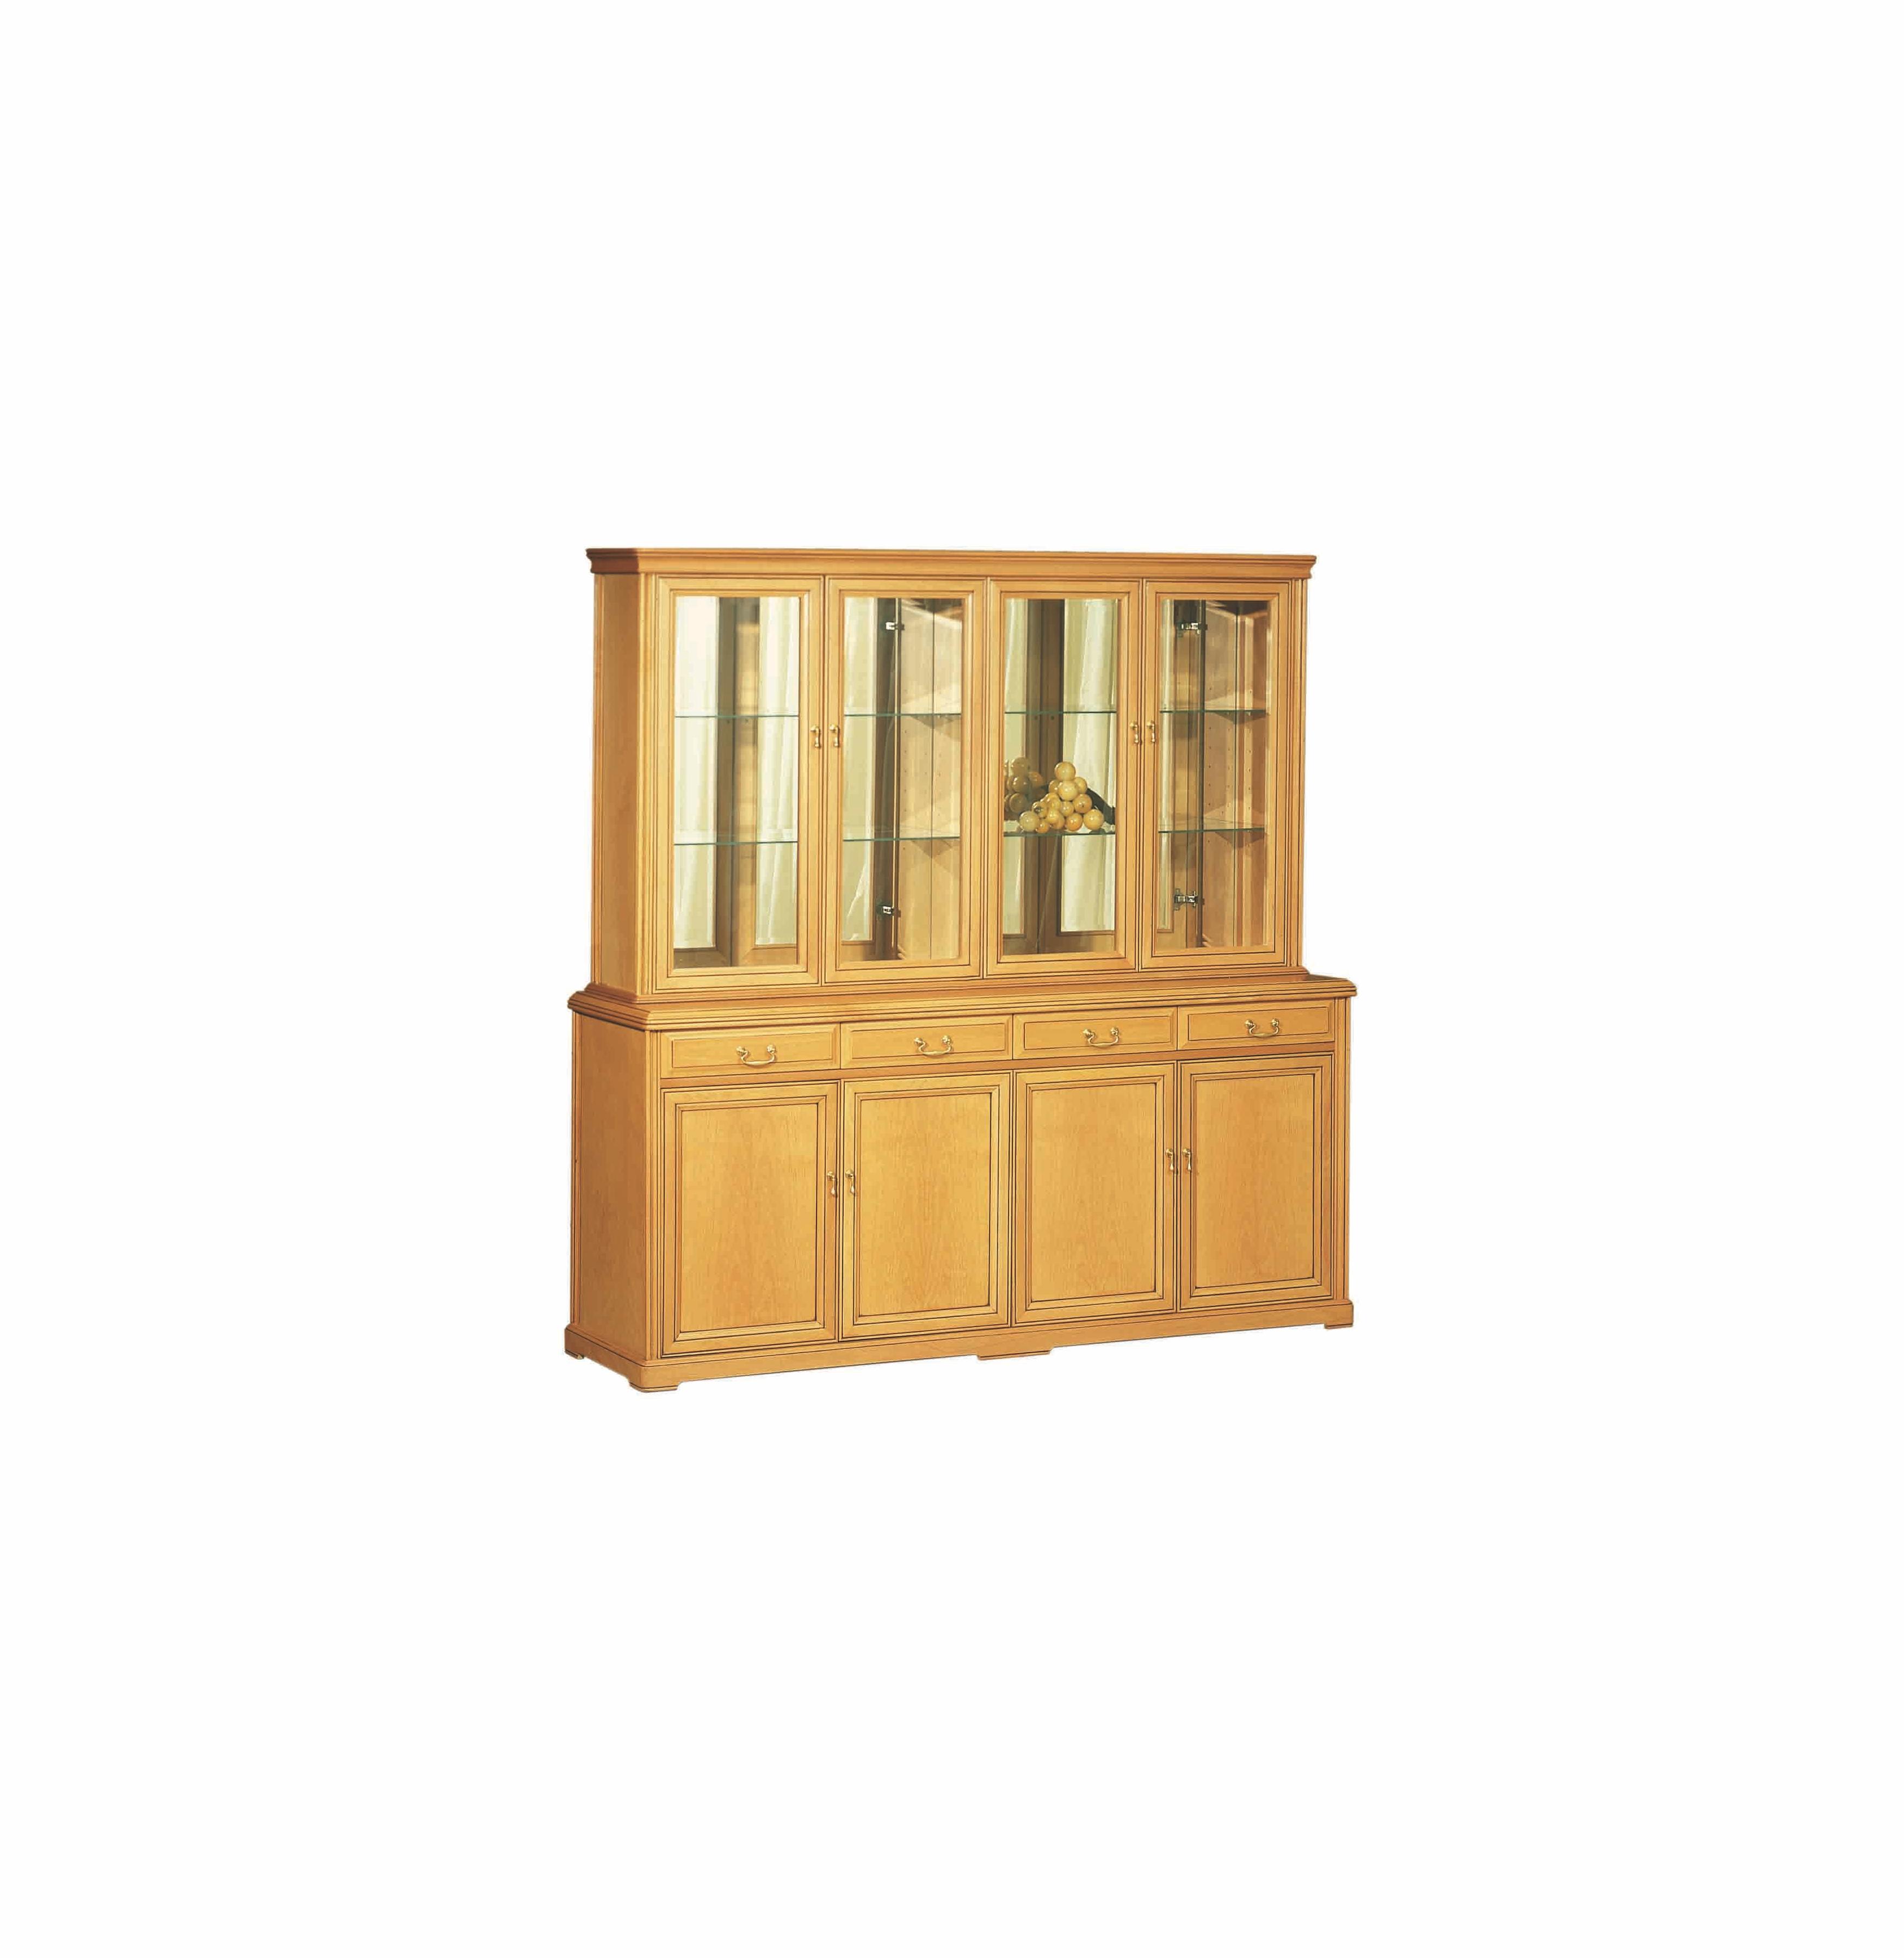 Nadia wall cabinet